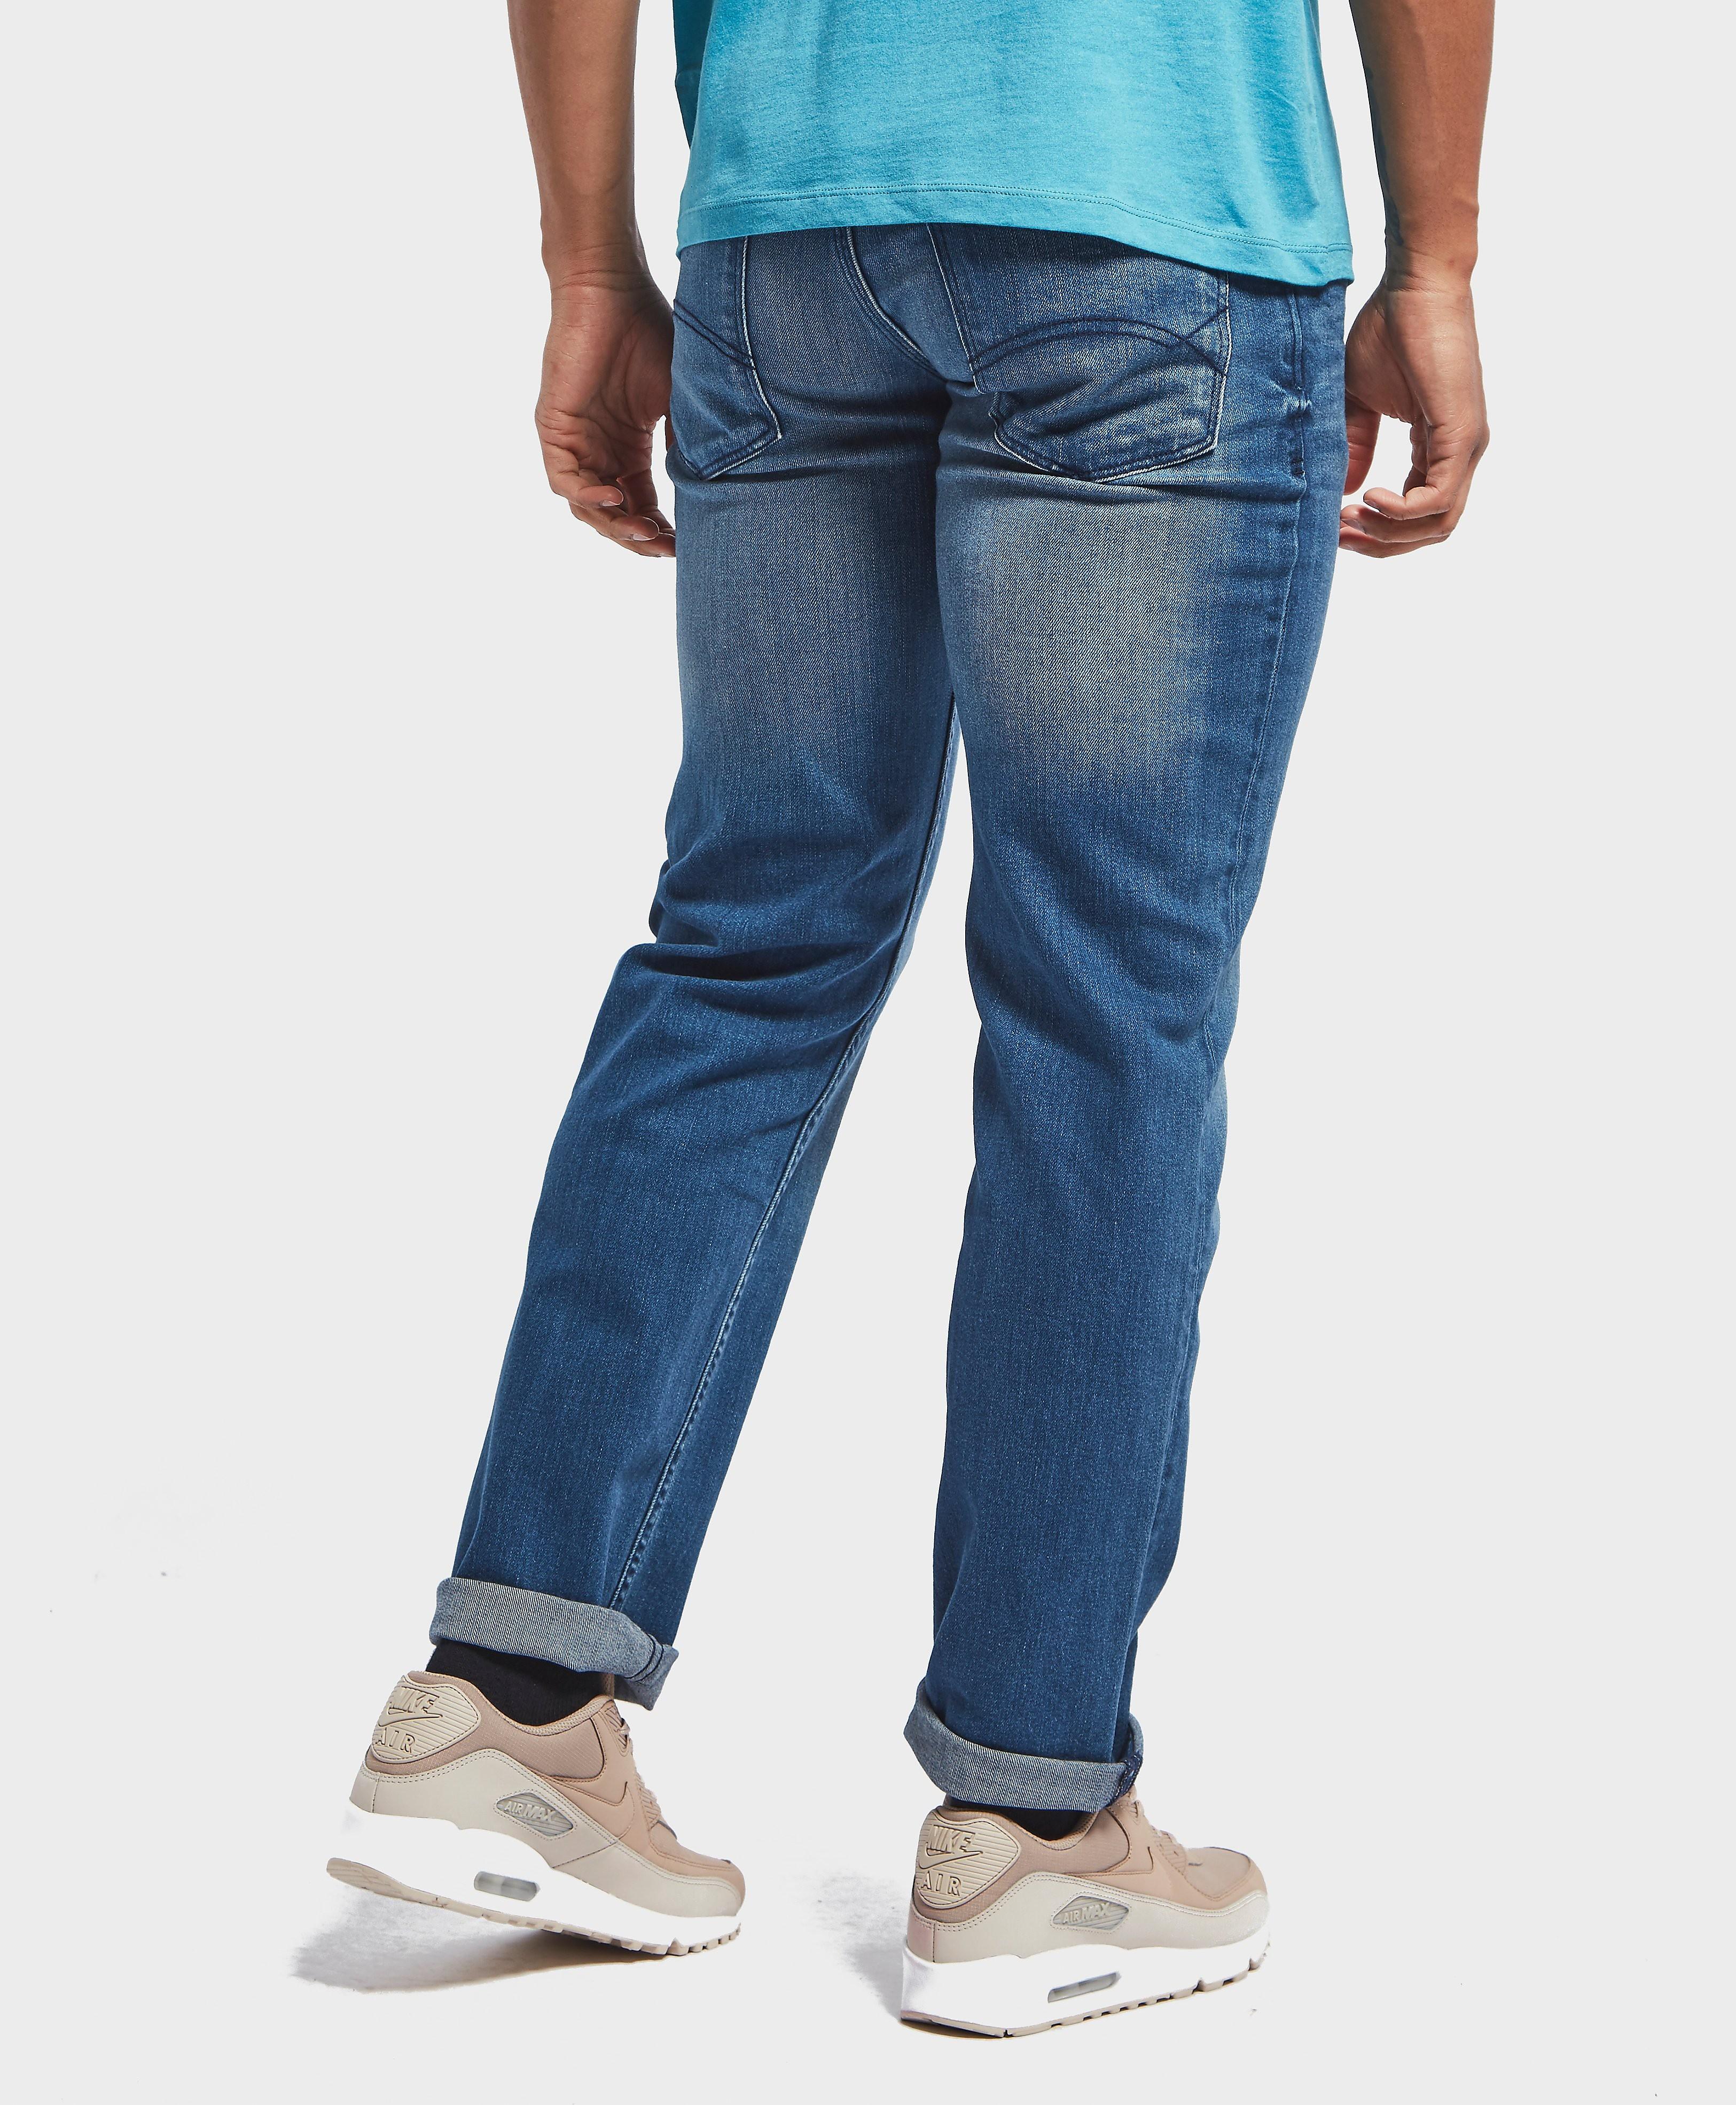 Tommy Hilfiger Ryan Straight Jeans